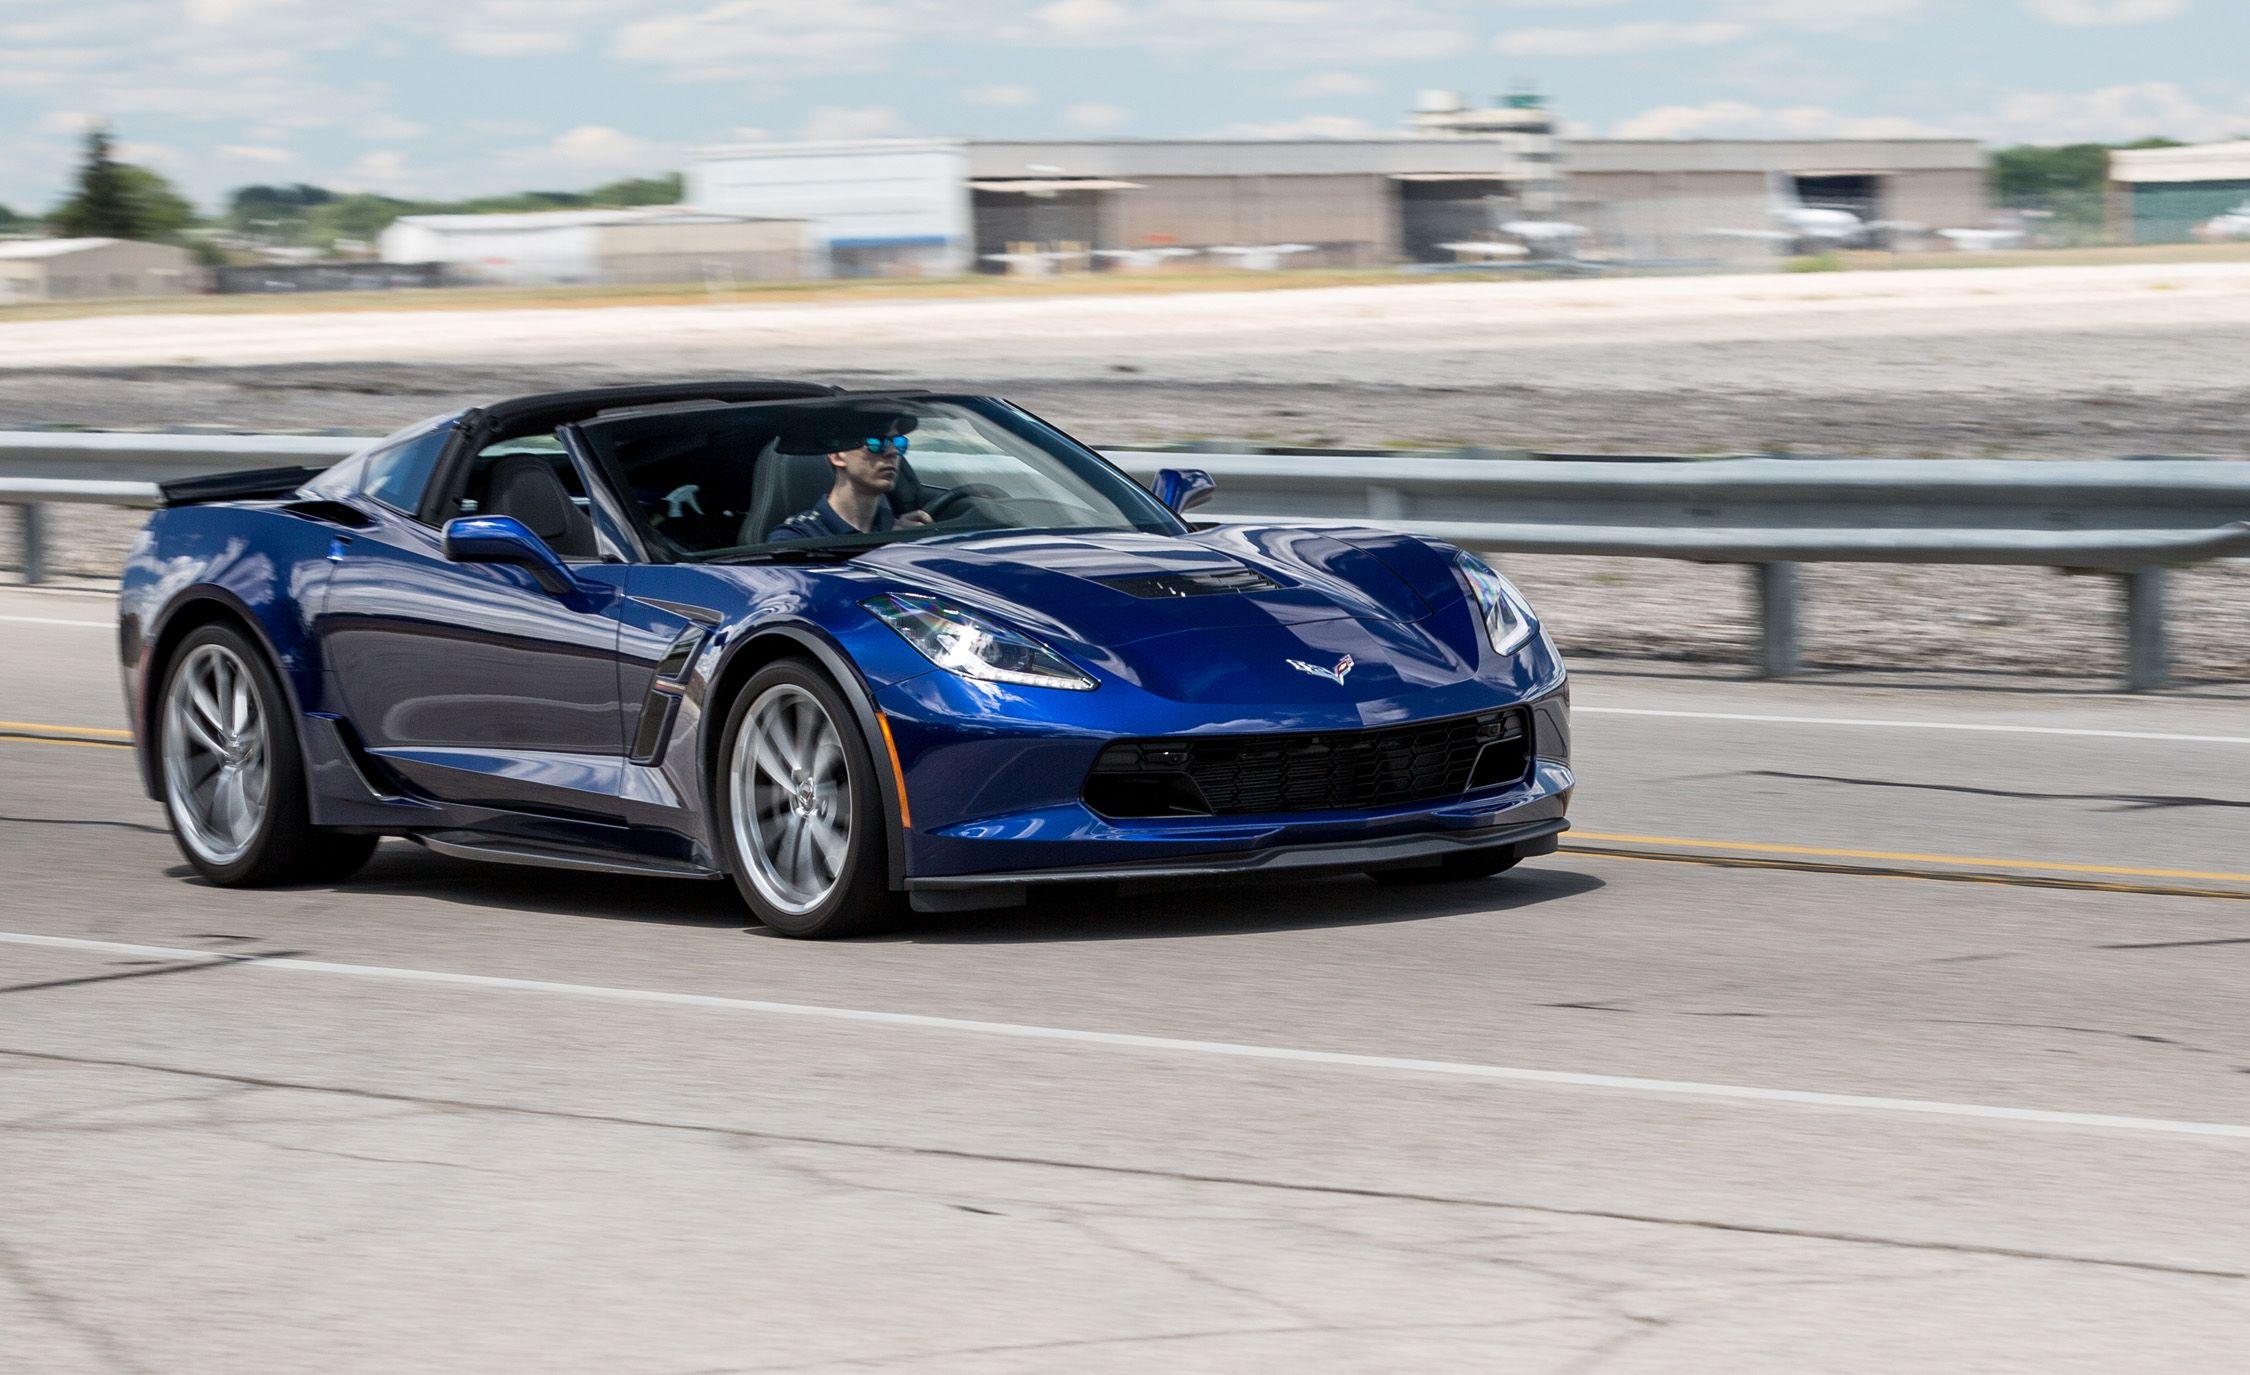 2017 chevrolet corvette grand sport long term test review car and driver